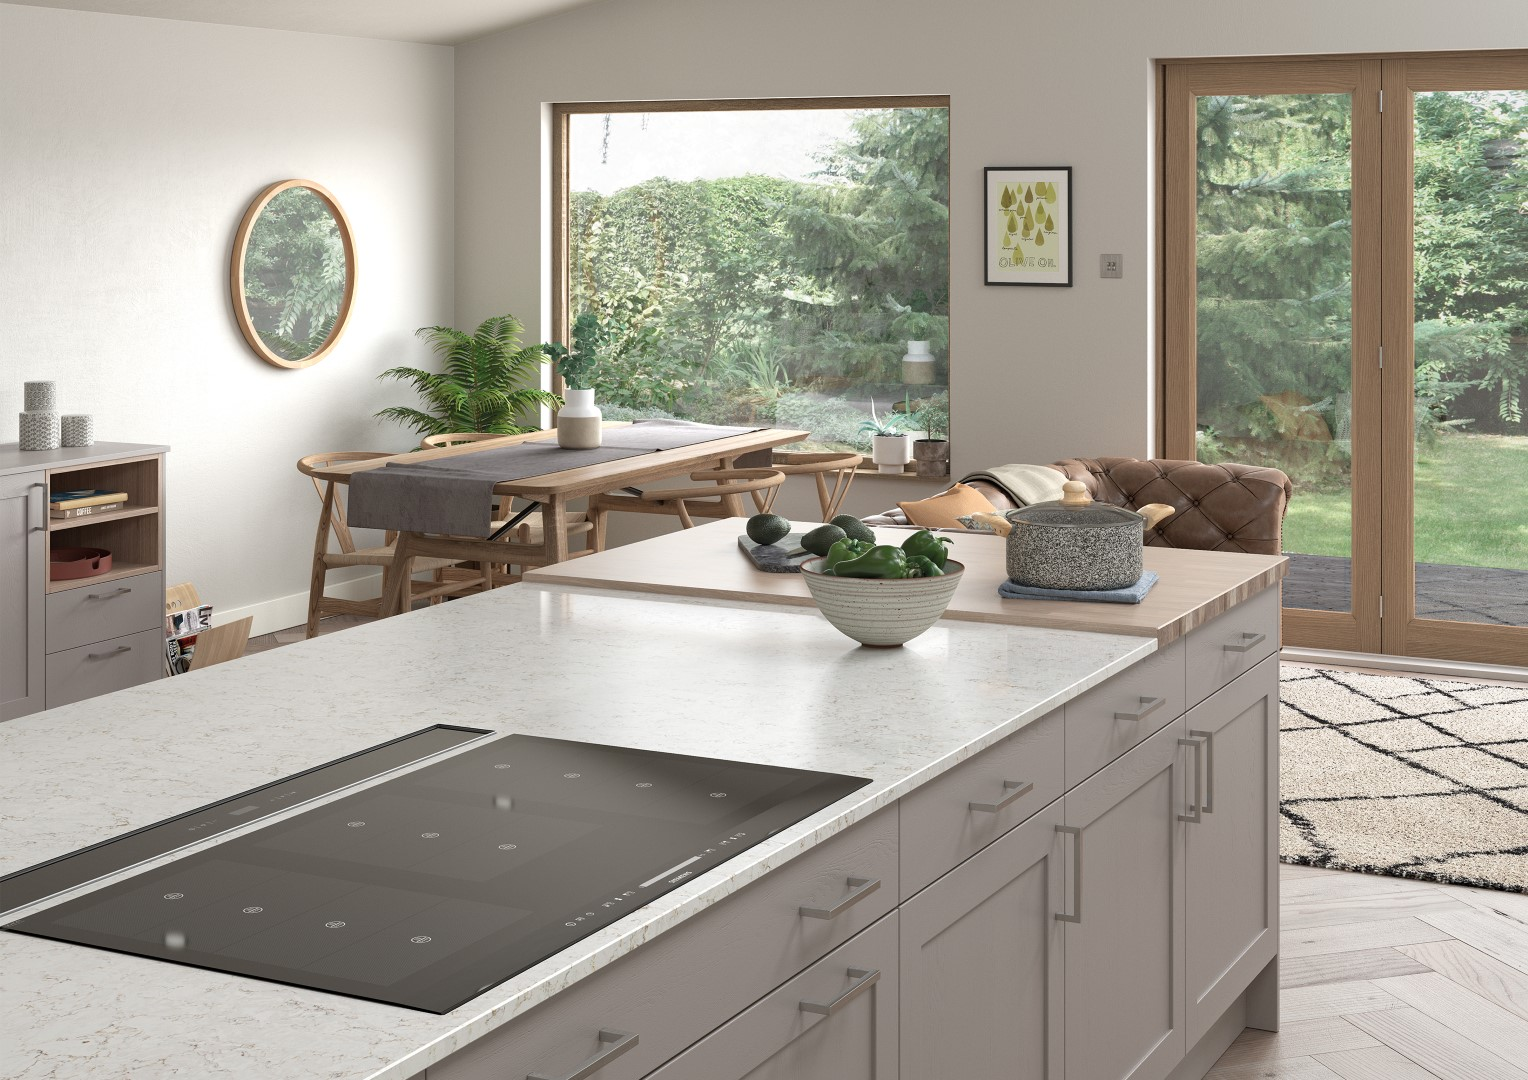 Aldana Porcelain and Cashmere - Kitchen Design - Alan Kelly Kitchens - Waterford - 1